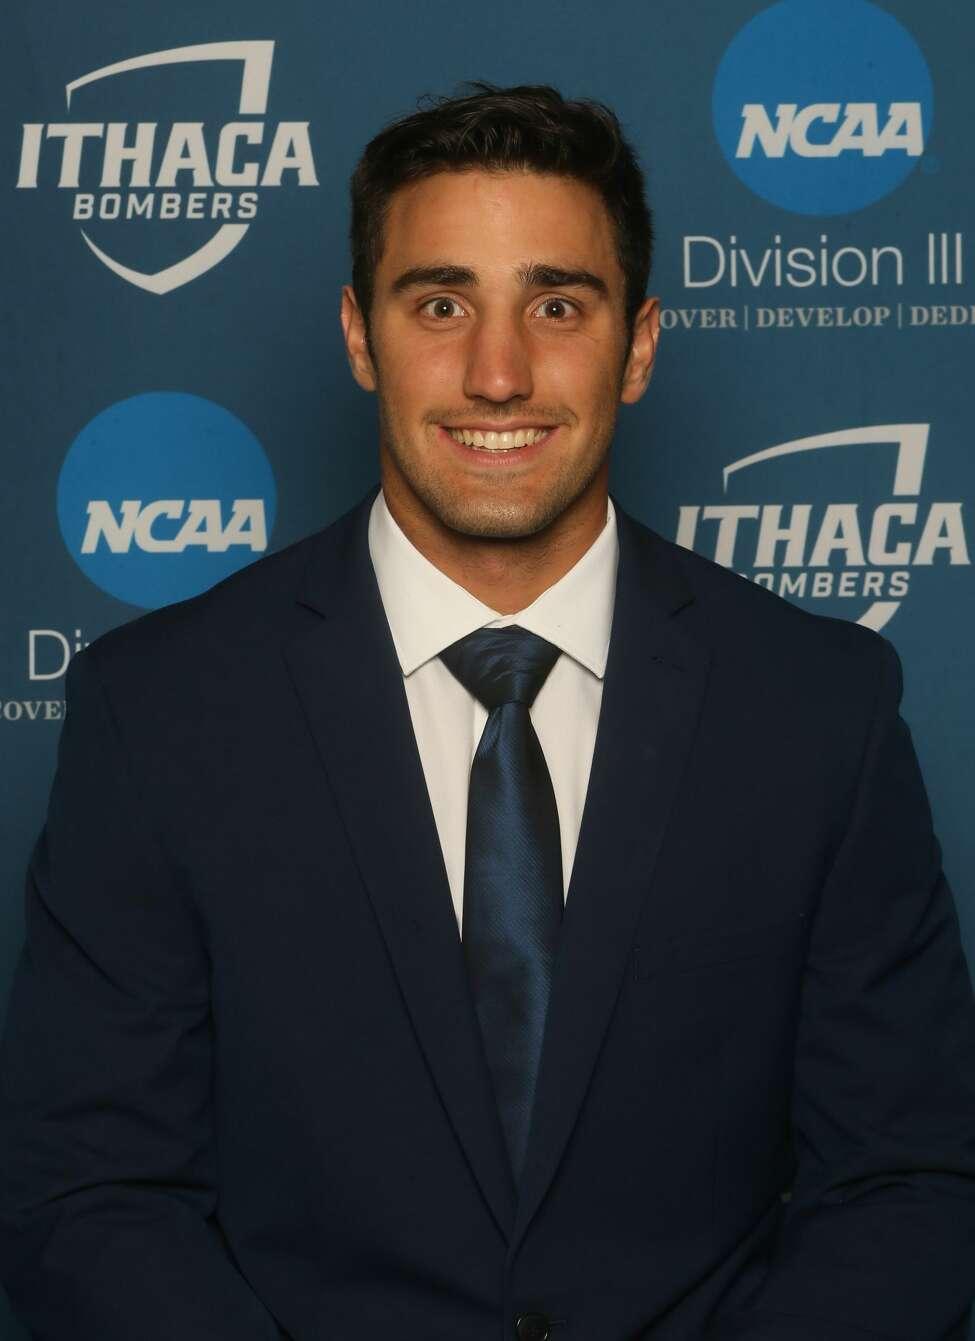 La Salle Institute graduate Joe Germinerio of the Ithaca football team. (Courtesy of Ithaca Athletics)